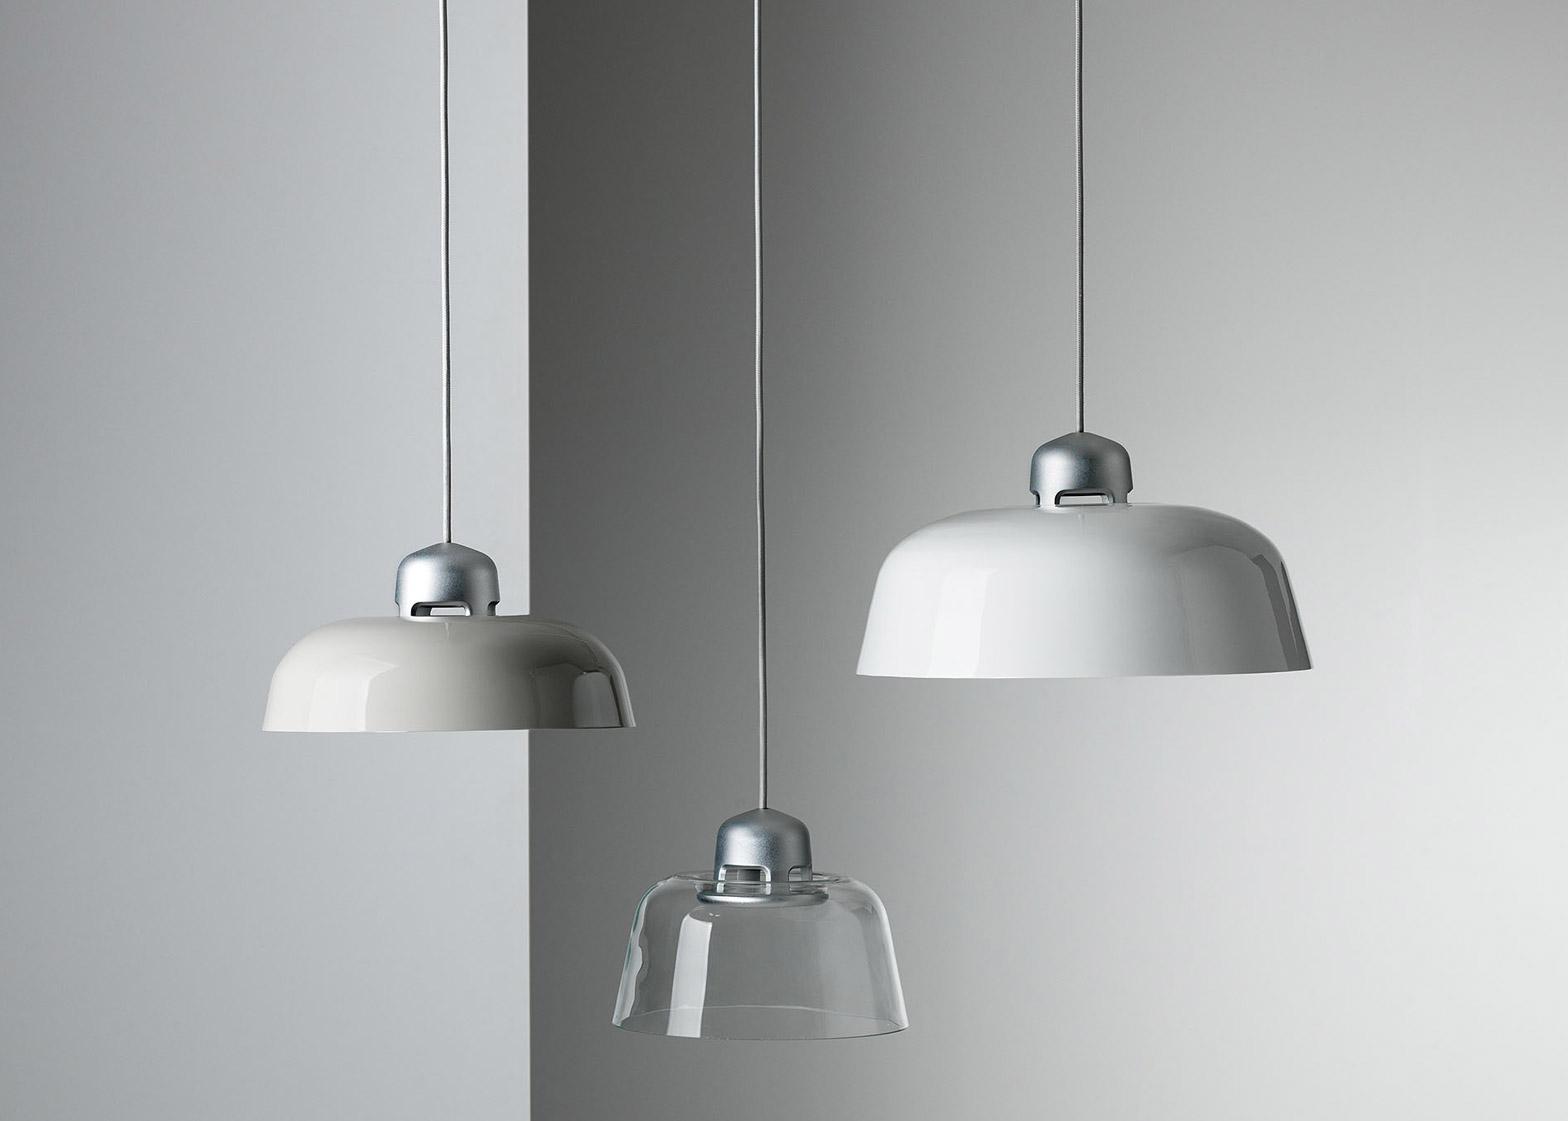 industrial lamps design 5 of 5; w162 dalston by wästberg VUIKYBX